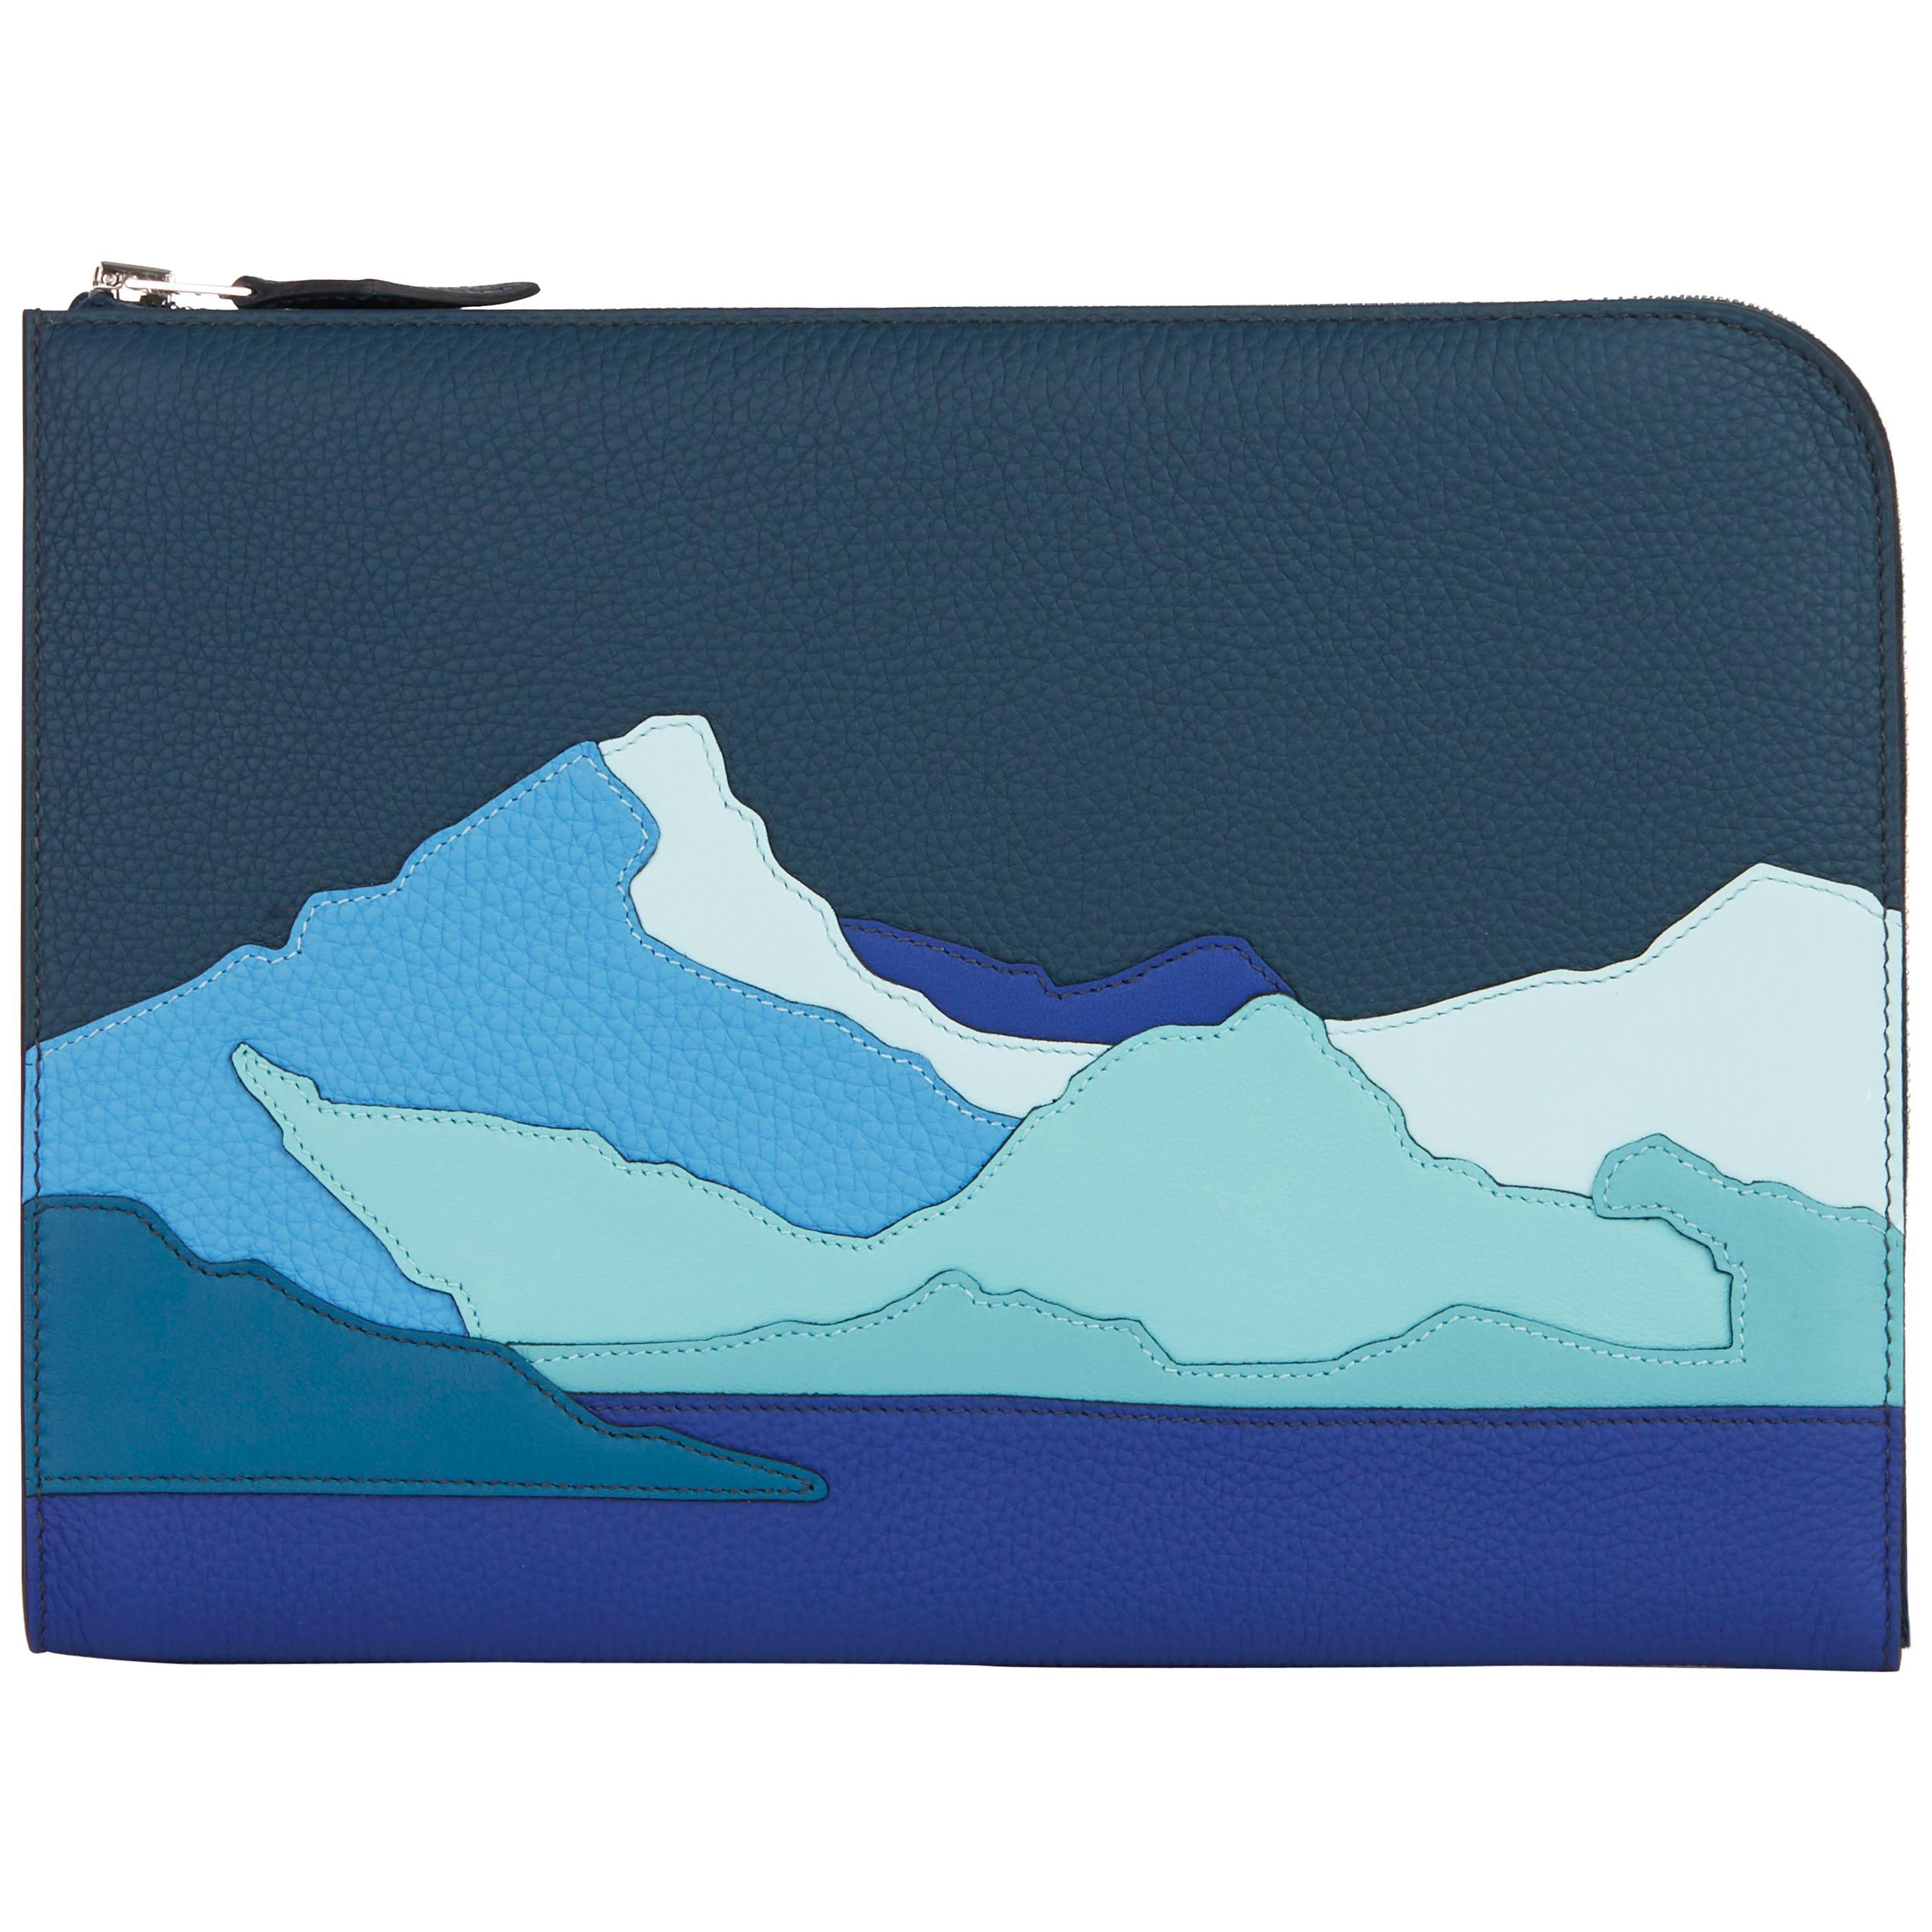 2019 Hermès Bleu de Prusse & Bleu Electric Togo Leather Endless Road Zip Tablet